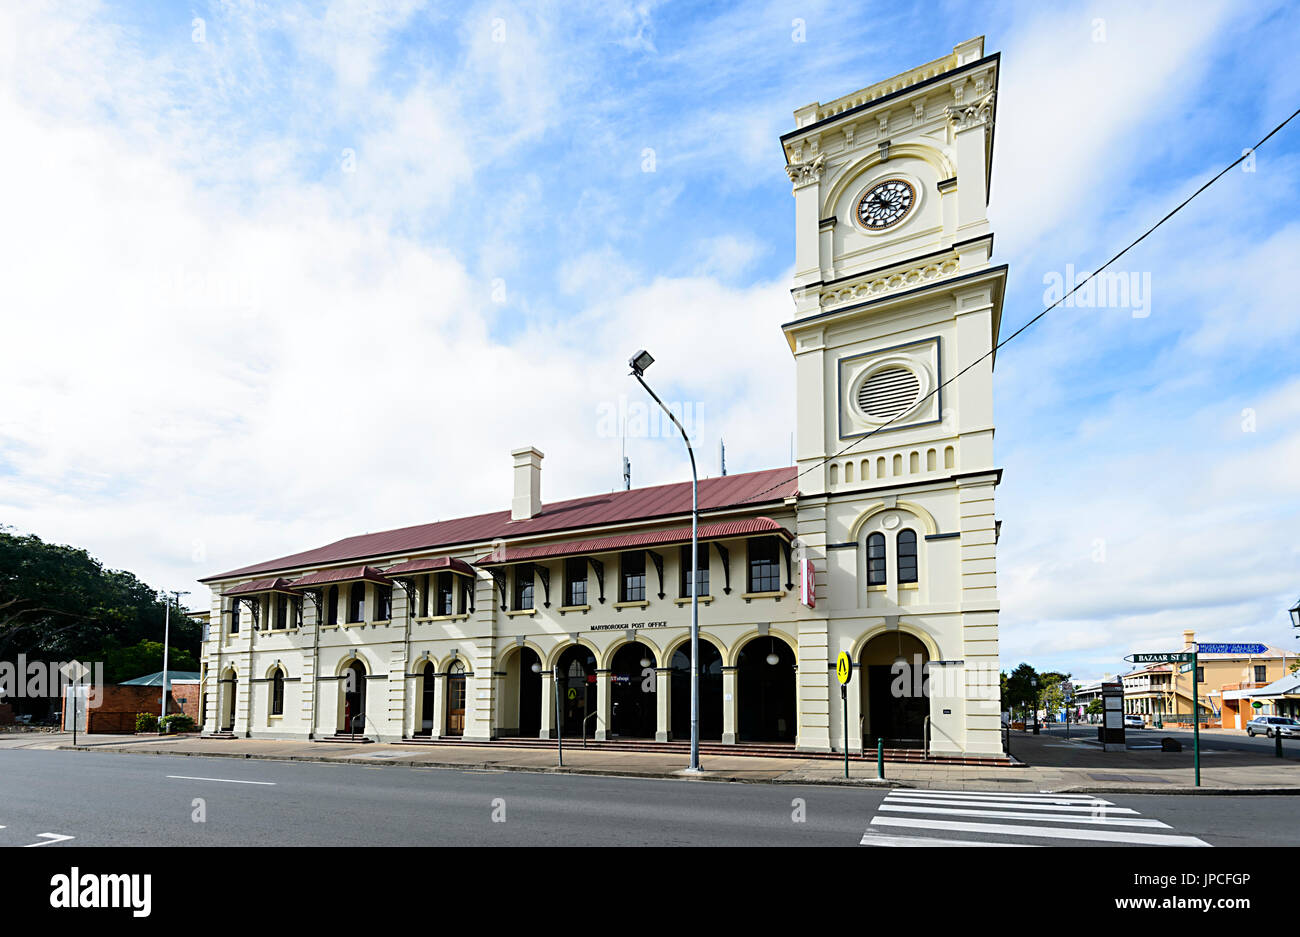 Historischen Postgebäude, Wharf Street, Heritage Precinct, Maryborough, Queensland, Queensland, Australien Stockbild